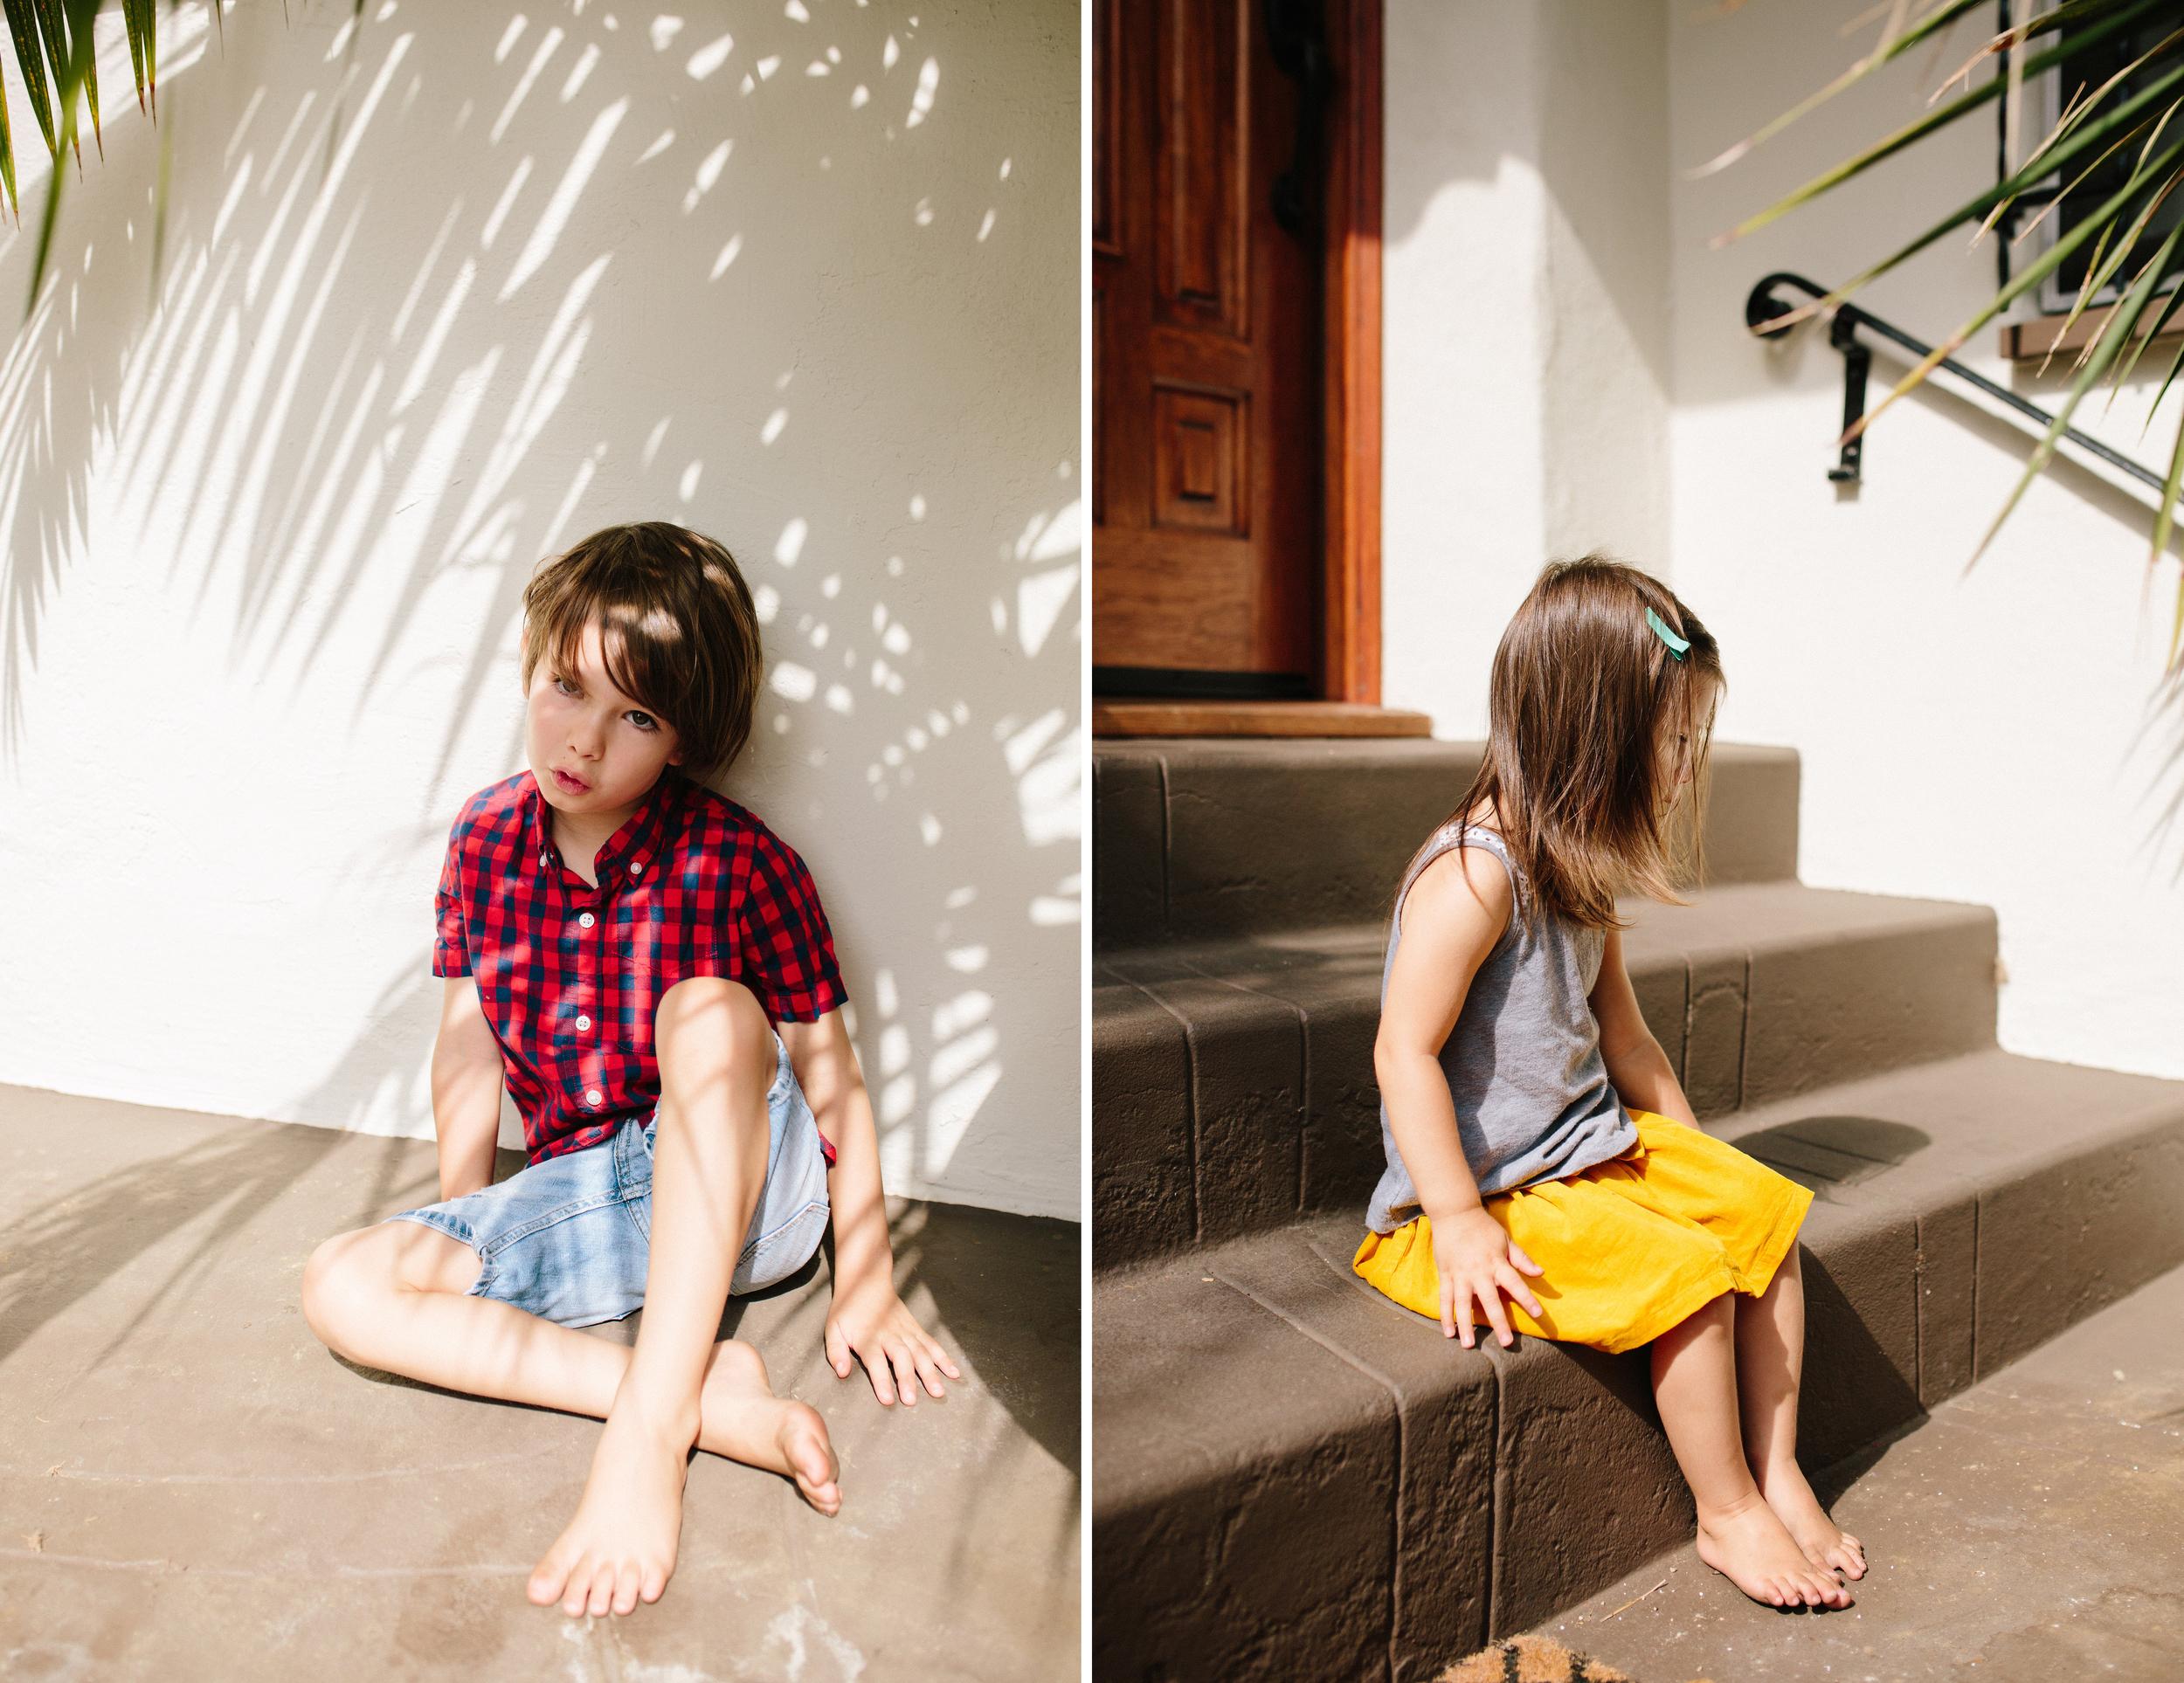 los-angeles-lifestyle-family-child-kid-baby-photographer_10.jpg